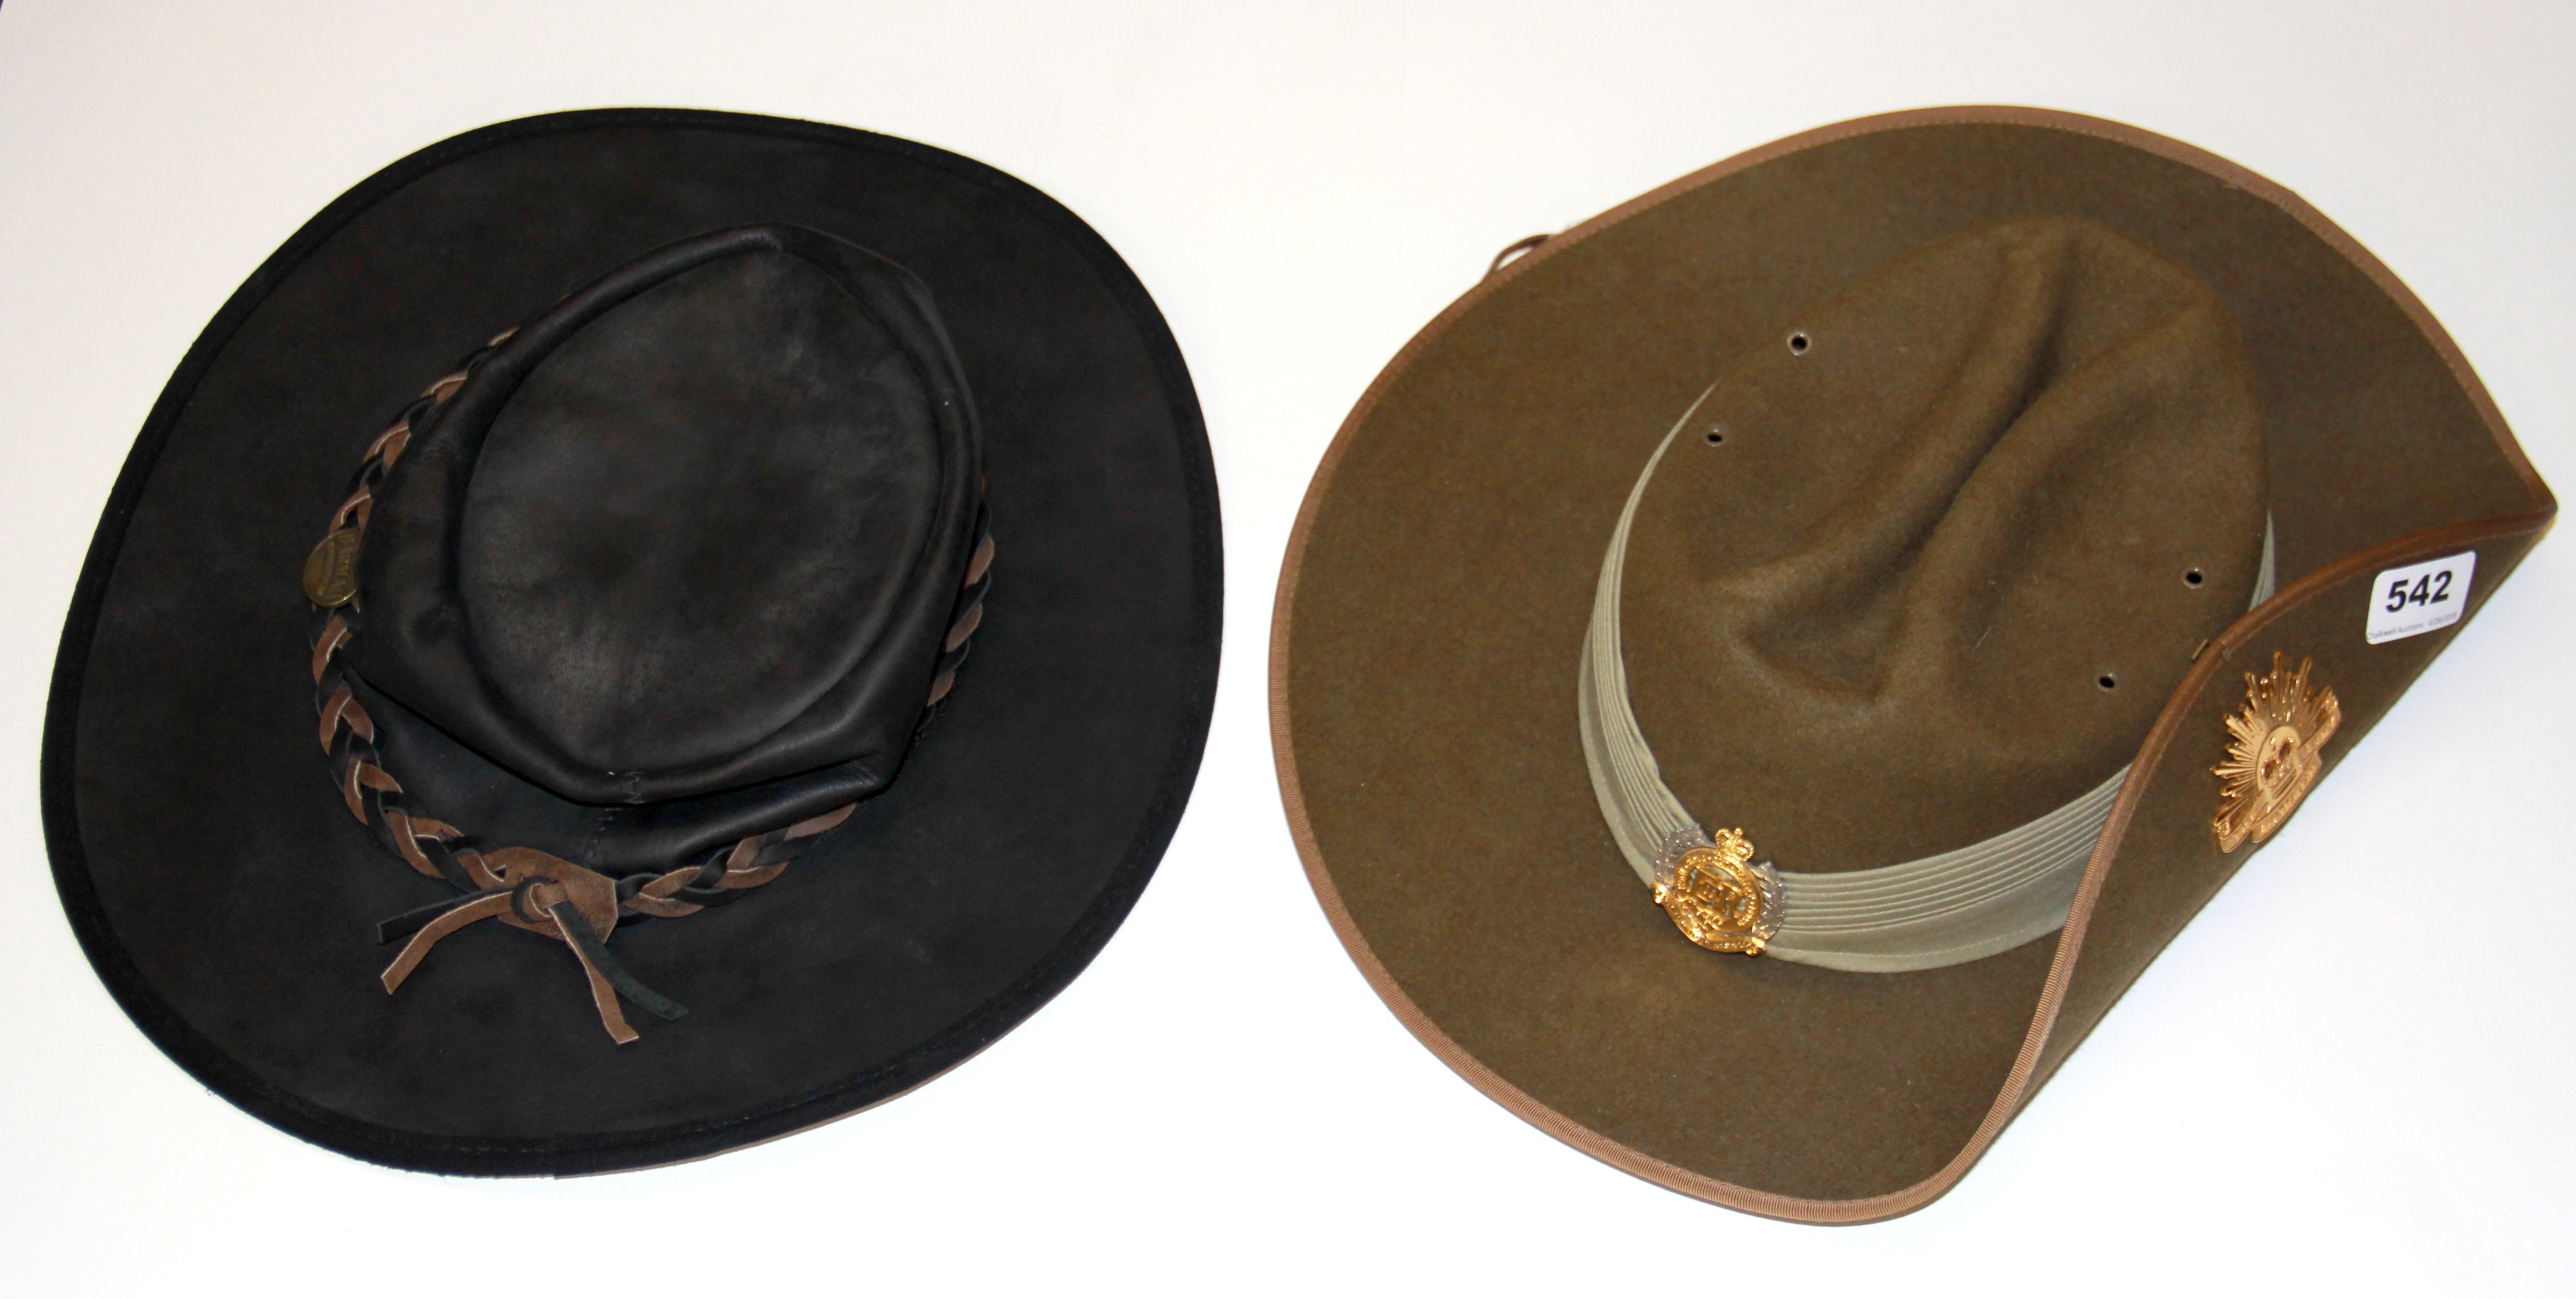 a3afc2b4ab532 An australian army bush hat and an australian barmah collapsible leath  lofty marketplace JPG 1000x504 Australian